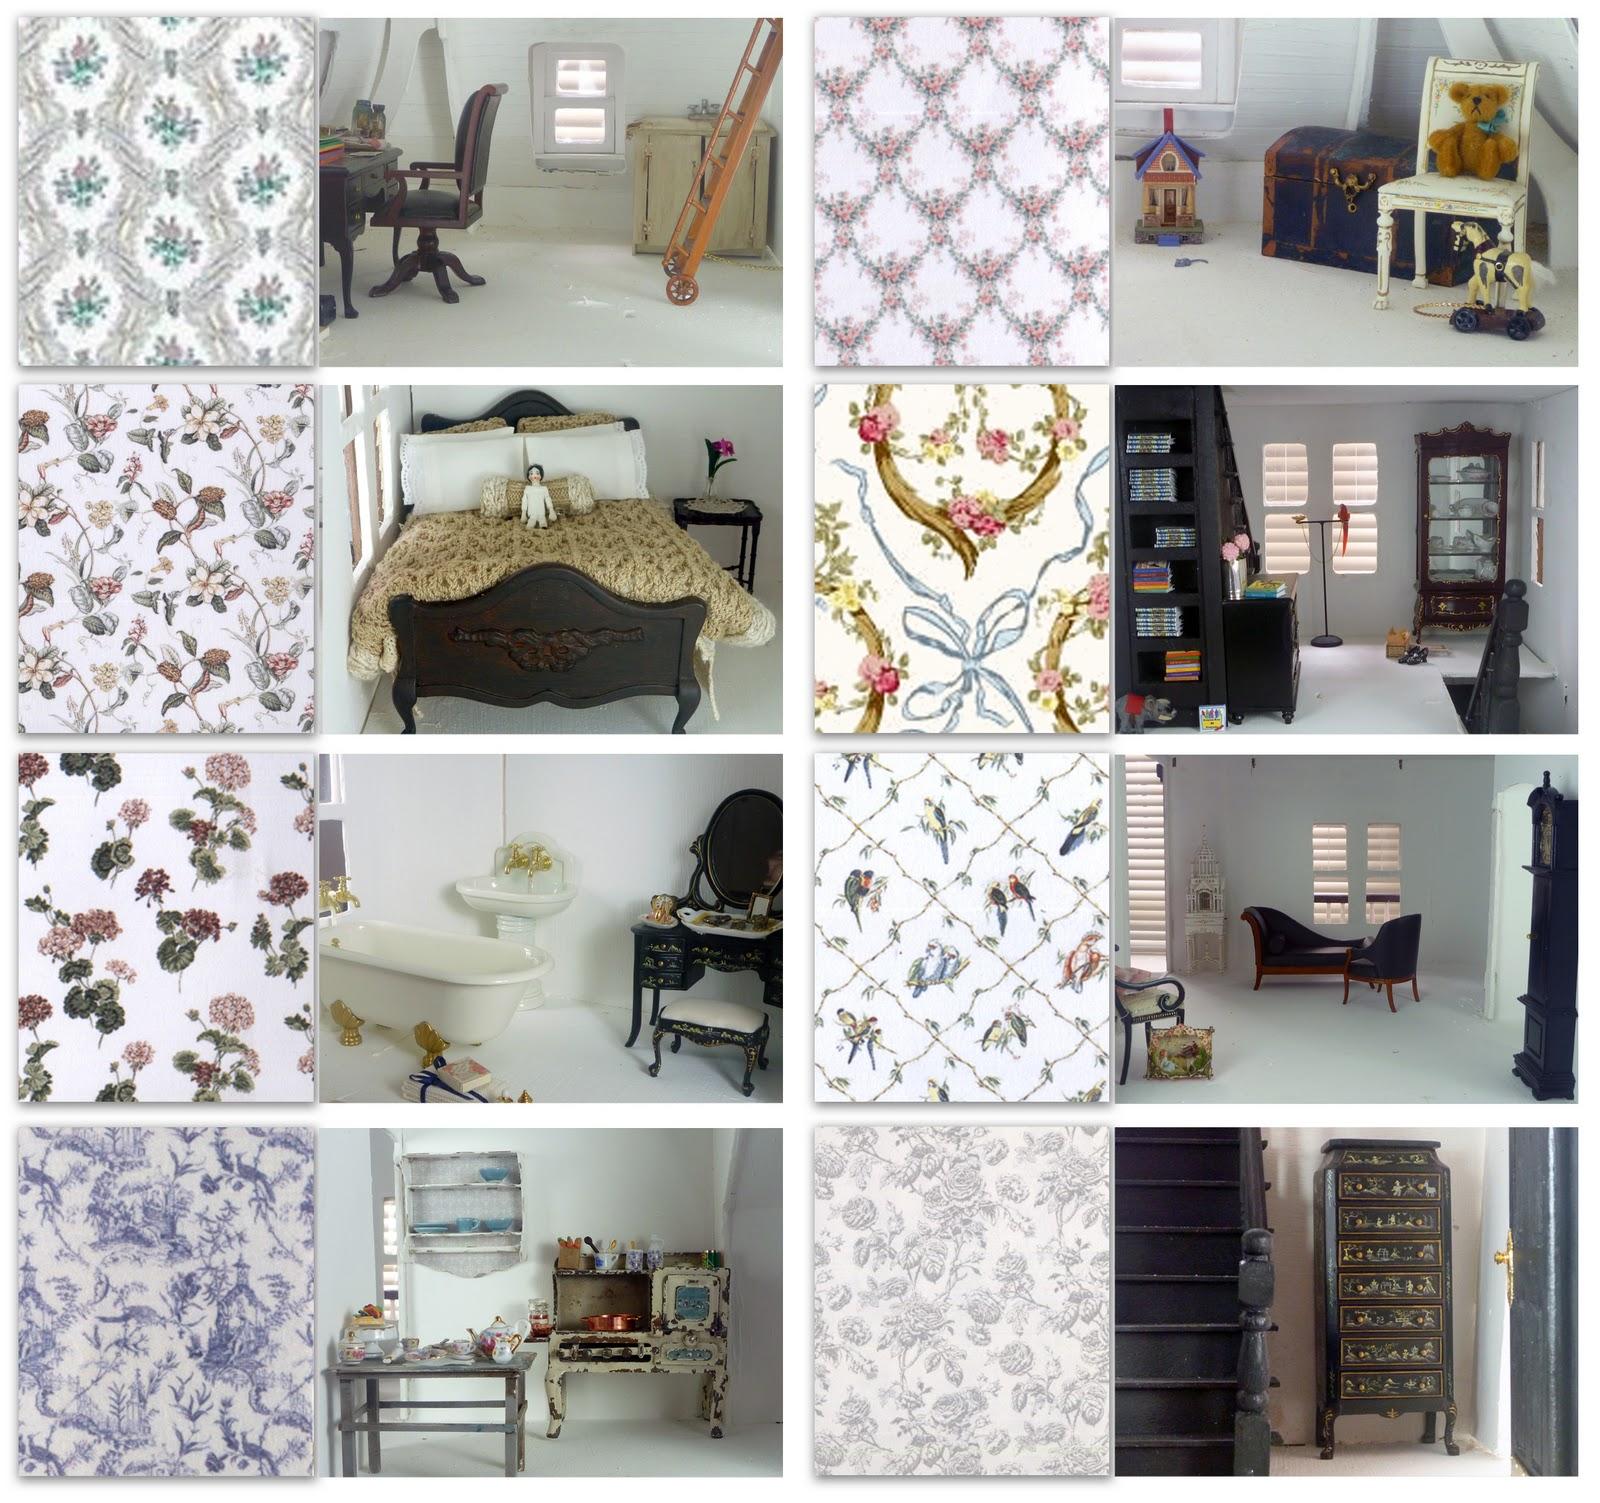 http://2.bp.blogspot.com/-voudXIxeB9M/TxQ357S0chI/AAAAAAAAAKk/U4Czkpi3Tks/s1600/wallpaper_samples1.jpg